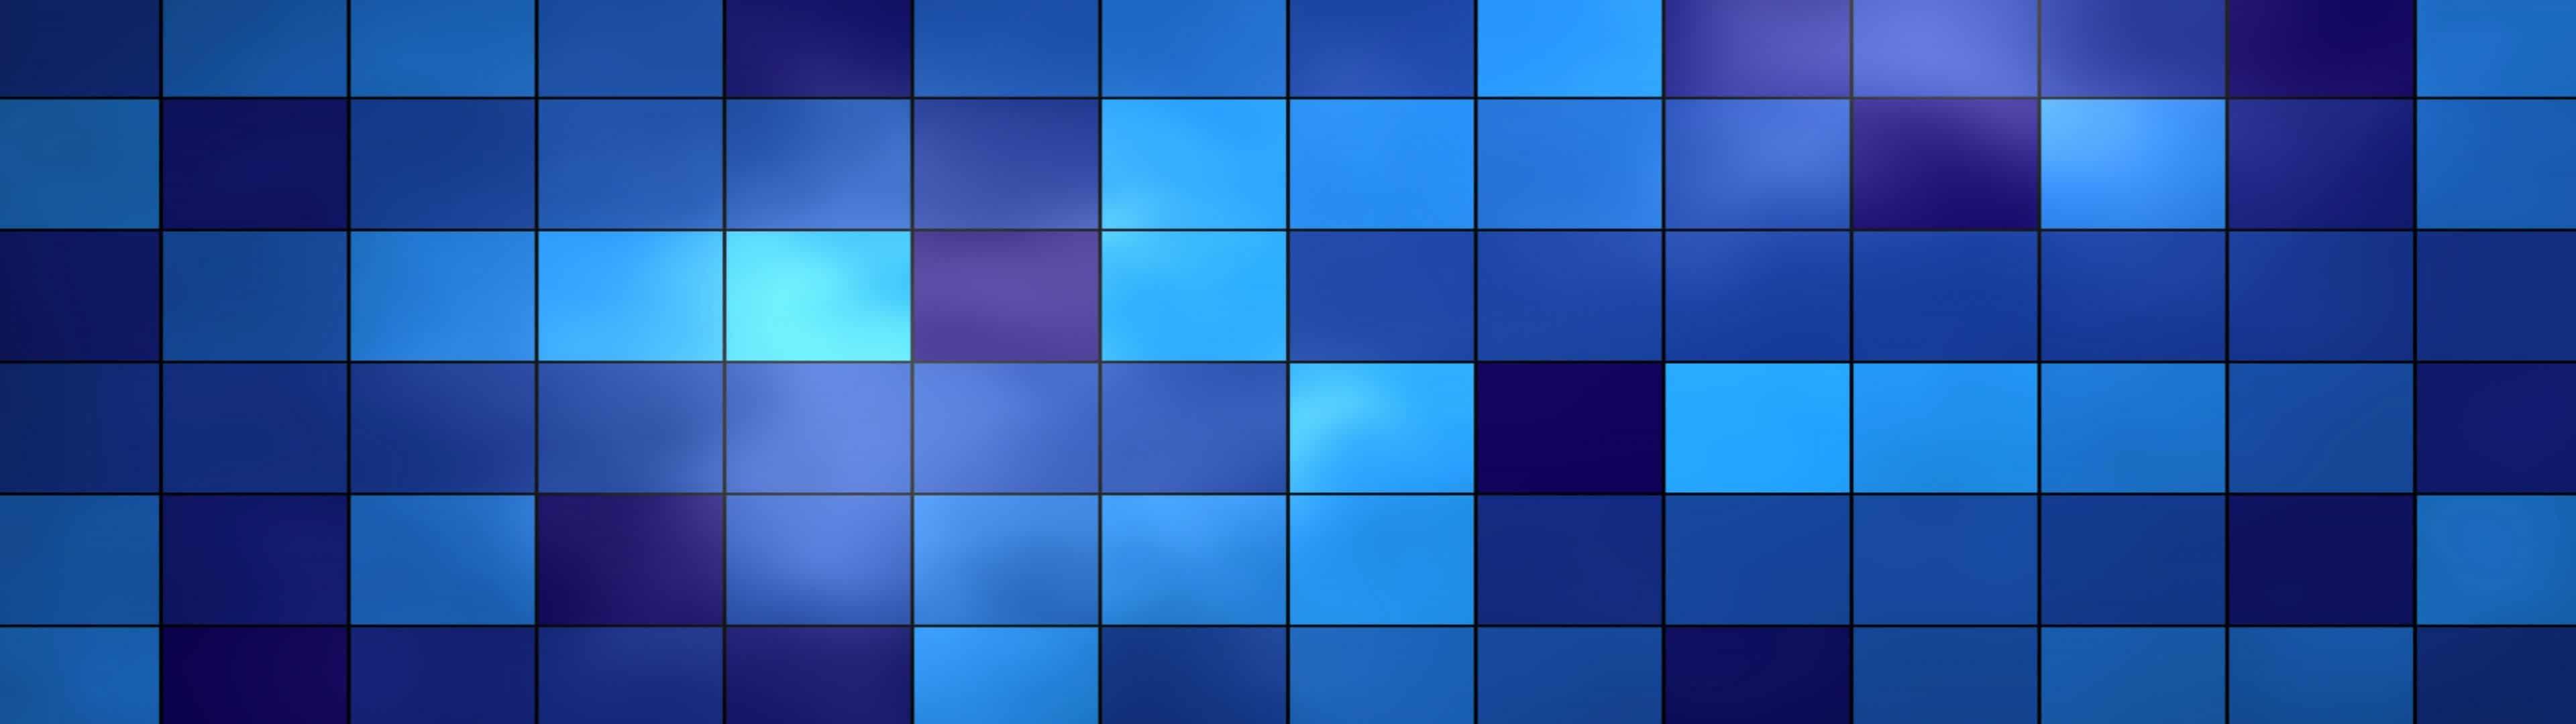 squares blue dual monitor wallpaper